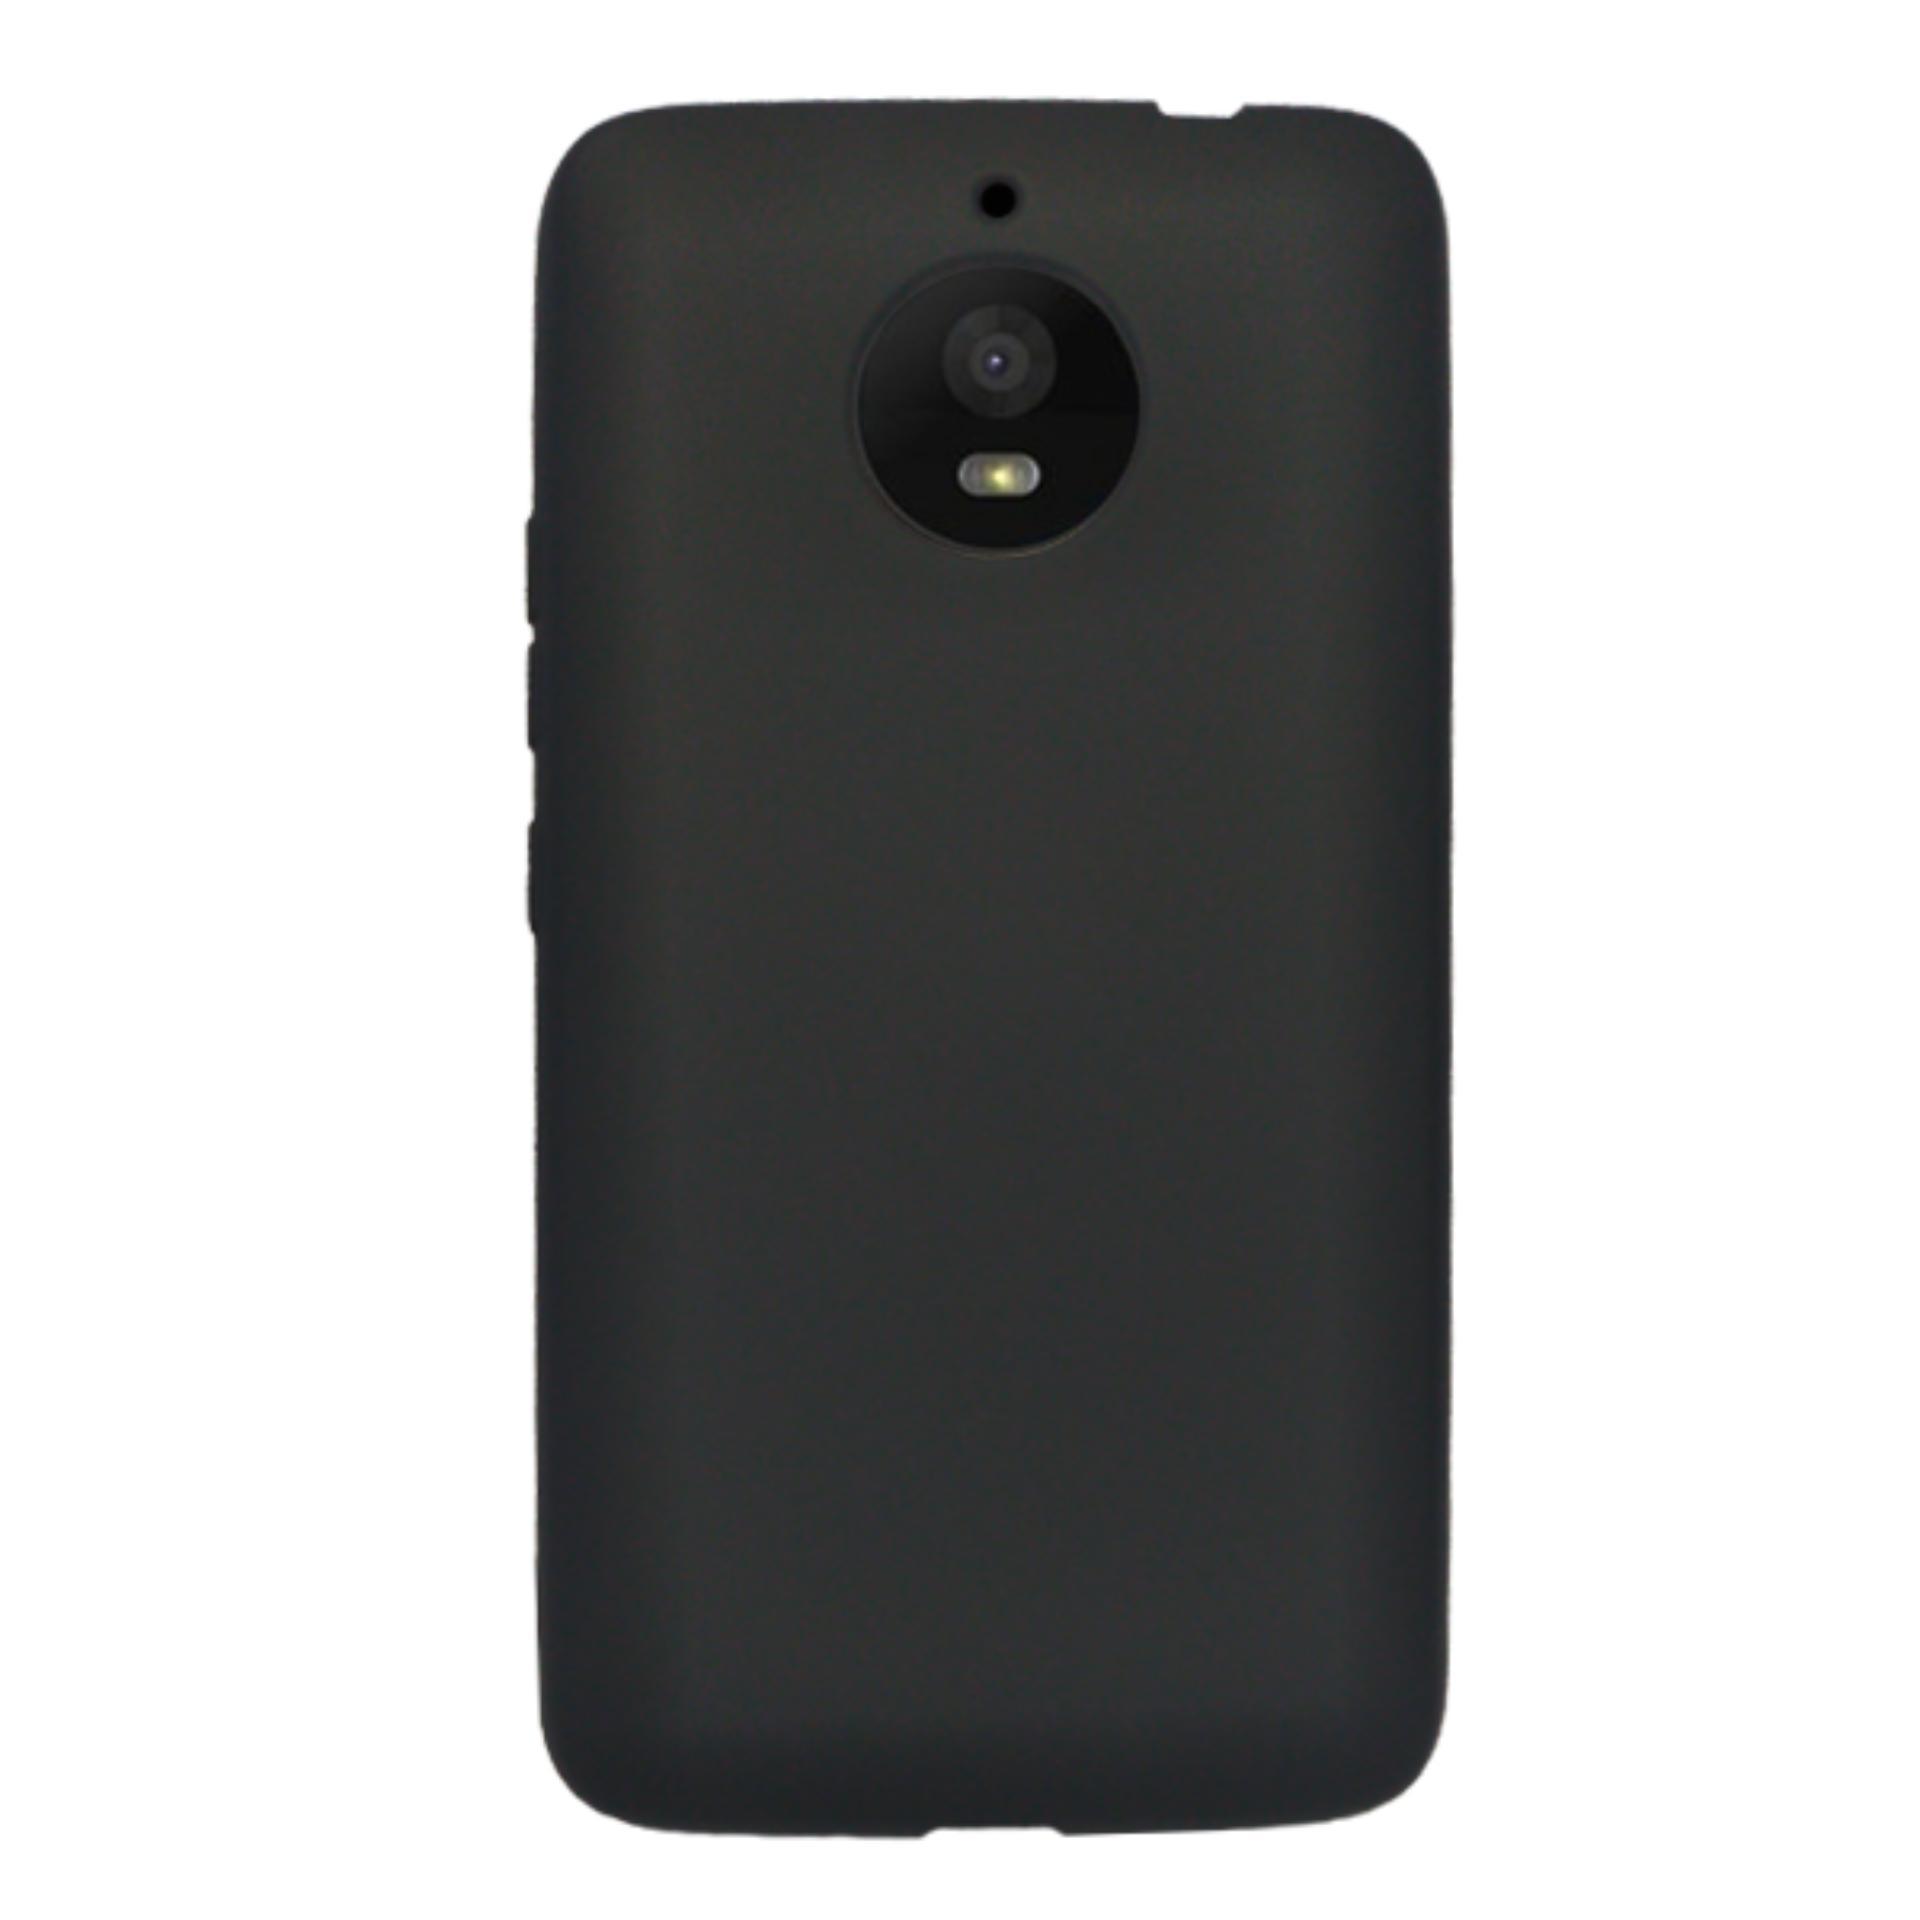 Case dyval Hardcase Motorola E4 Plus hitam